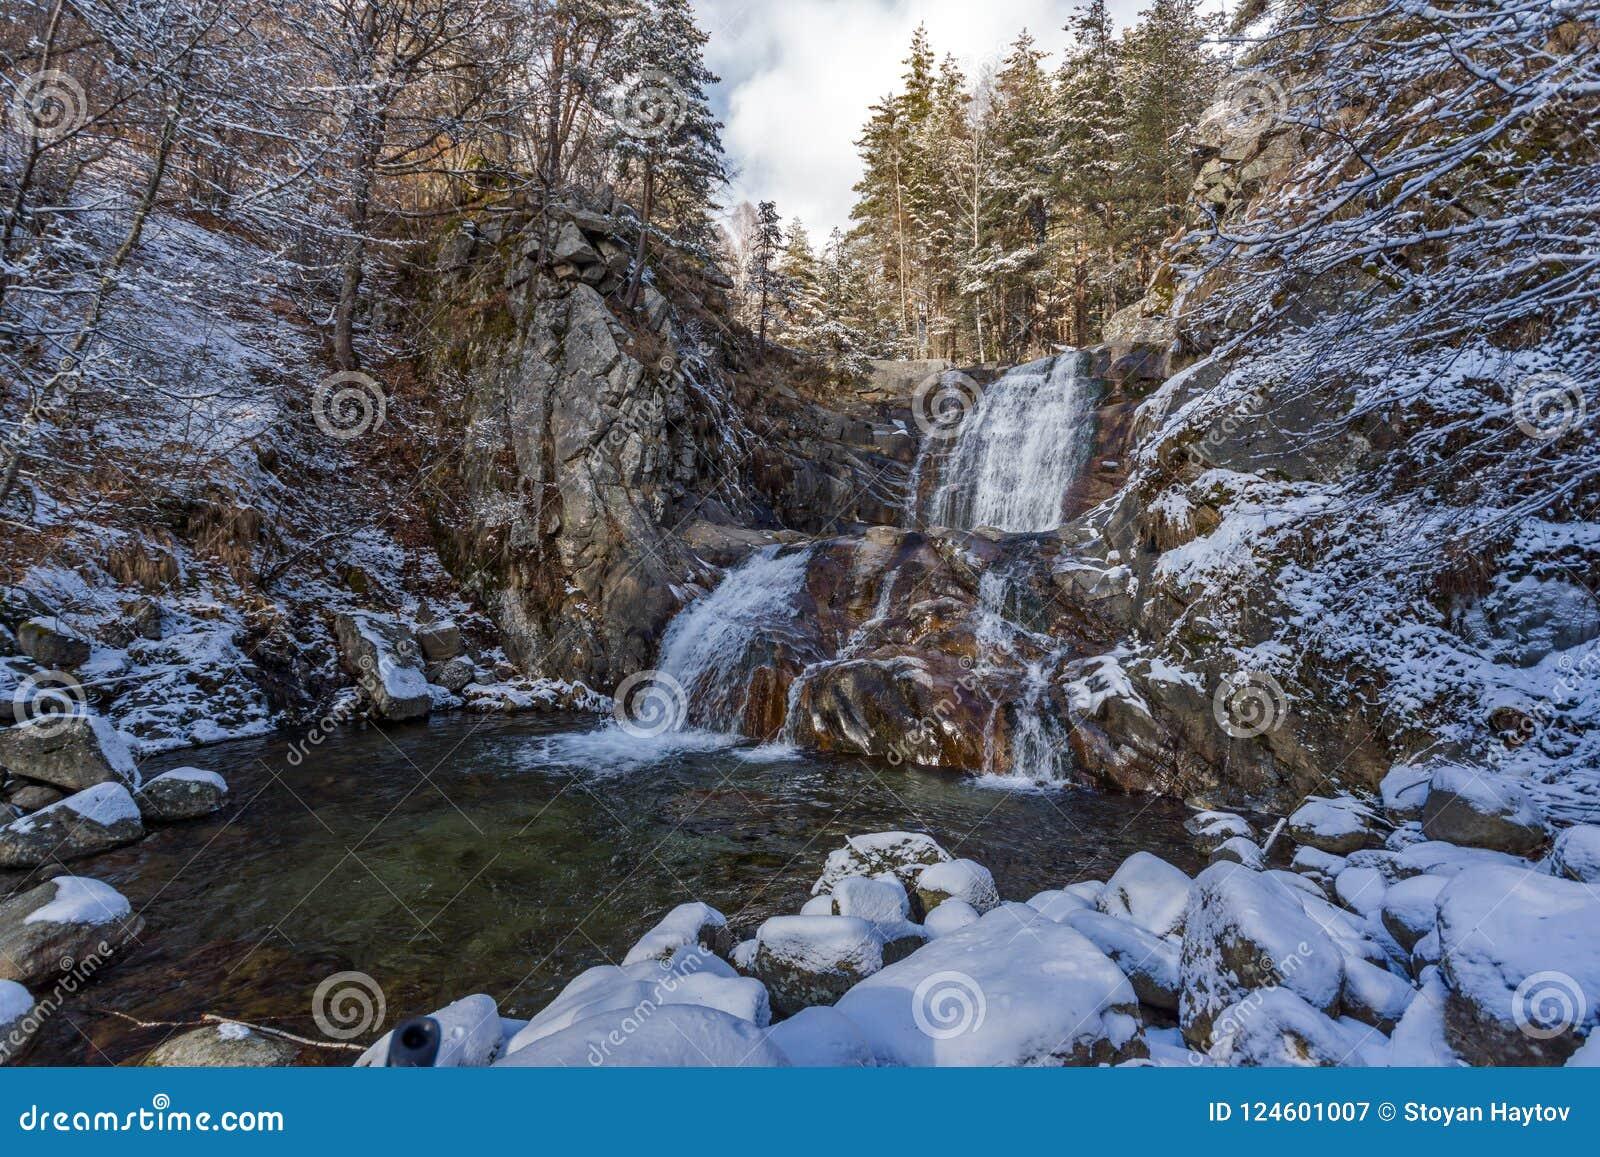 Paisaje del invierno de la cascada de Popina Laka cerca de la ciudad de Sandanski, montaña de Pirin, Bulgaria